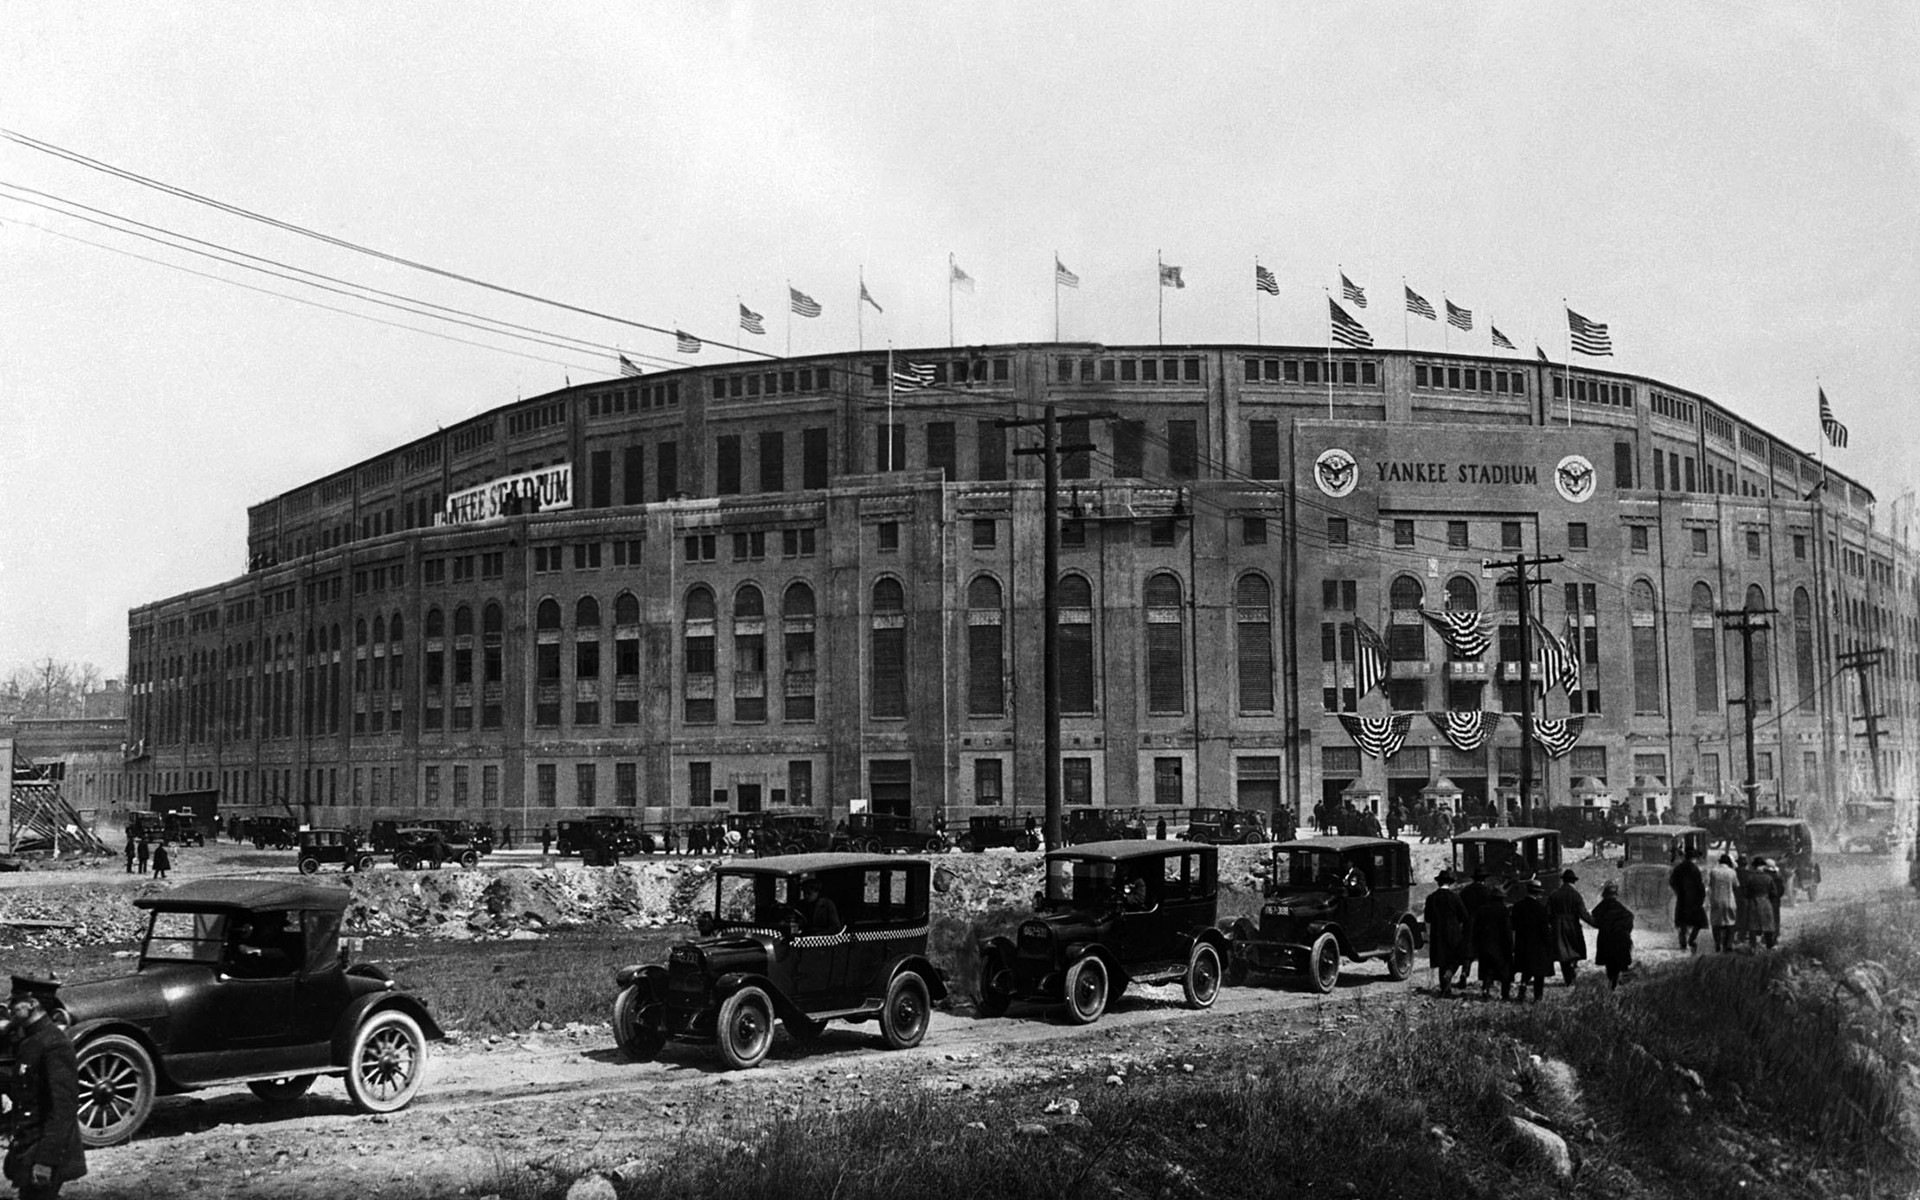 1920x1080 Yankee Stadium Wallpaper 183 ① Wallpapertag